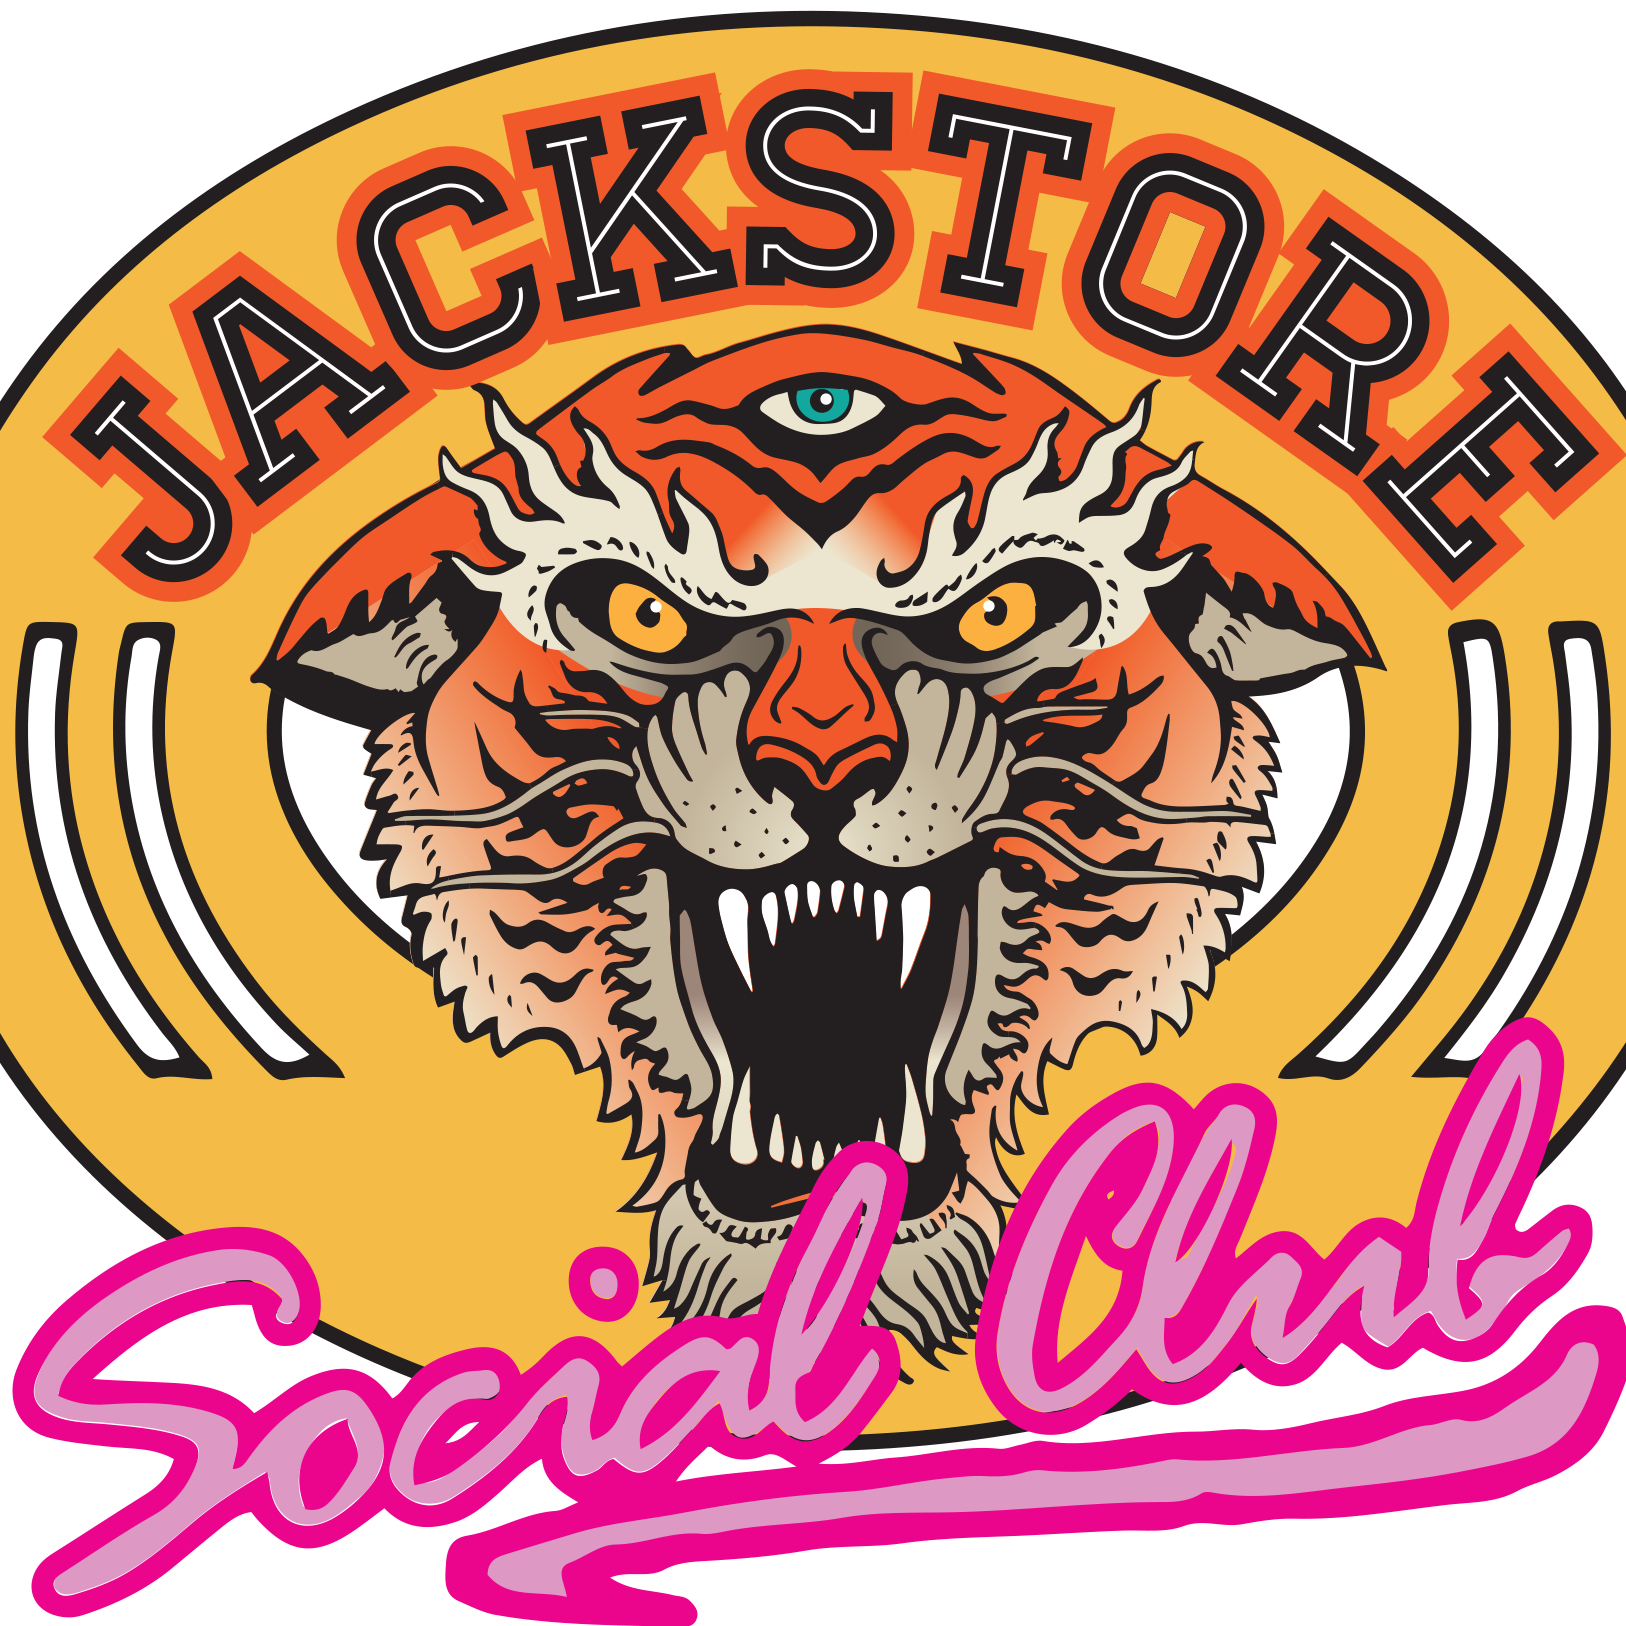 JACKSTORE SOCIAL CLUB